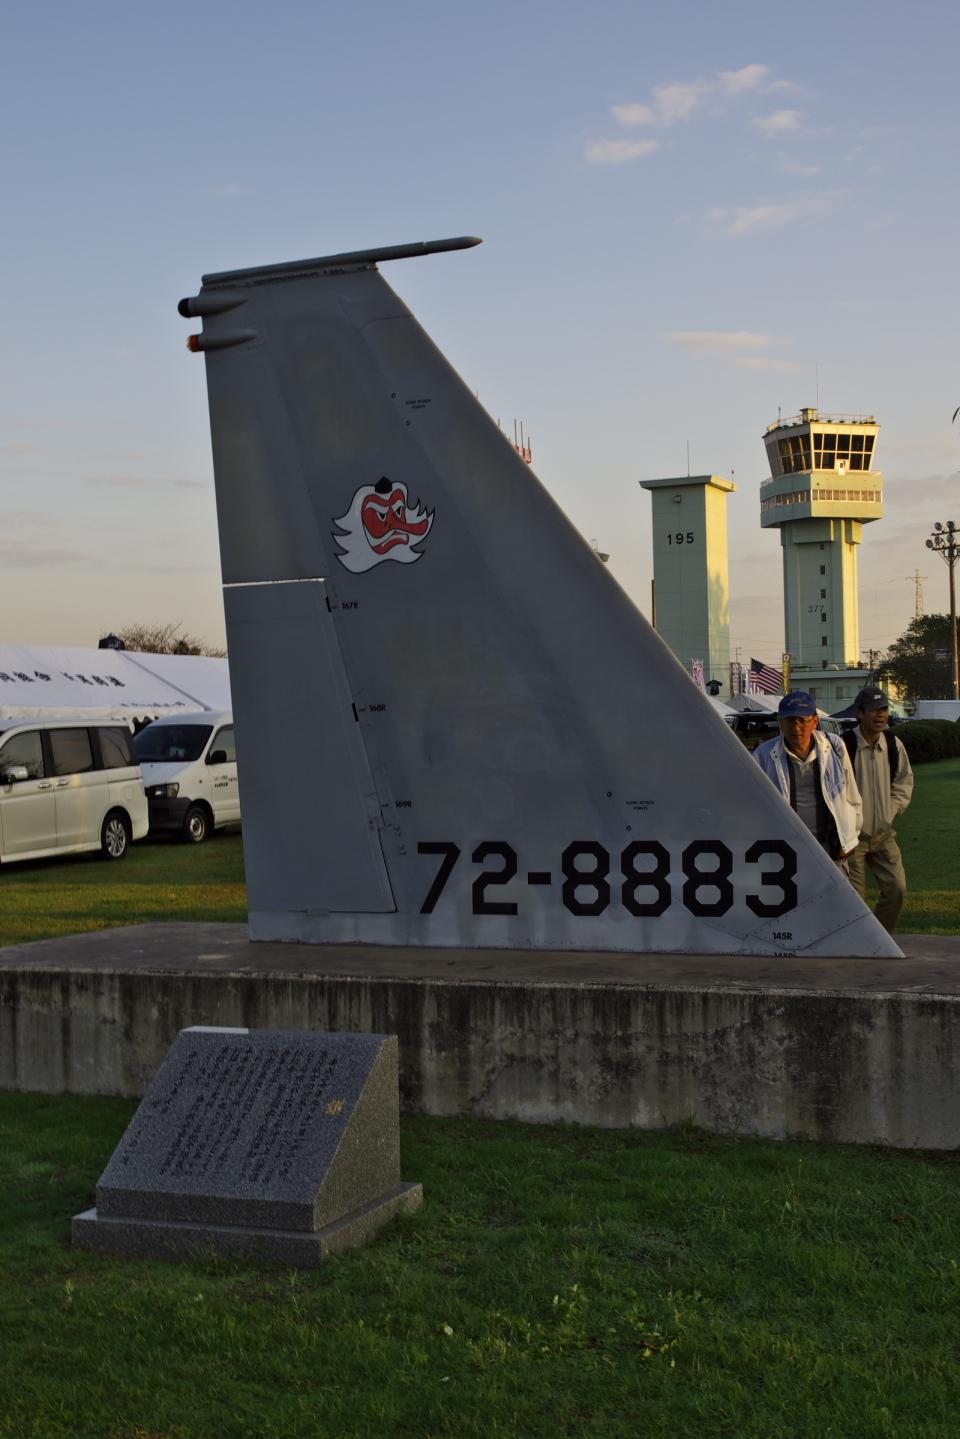 kanade/Ryo@S.O.R.A.さんの航空自衛隊 Mitsubishi F-15J Eagle (72-8883) 航空フォト